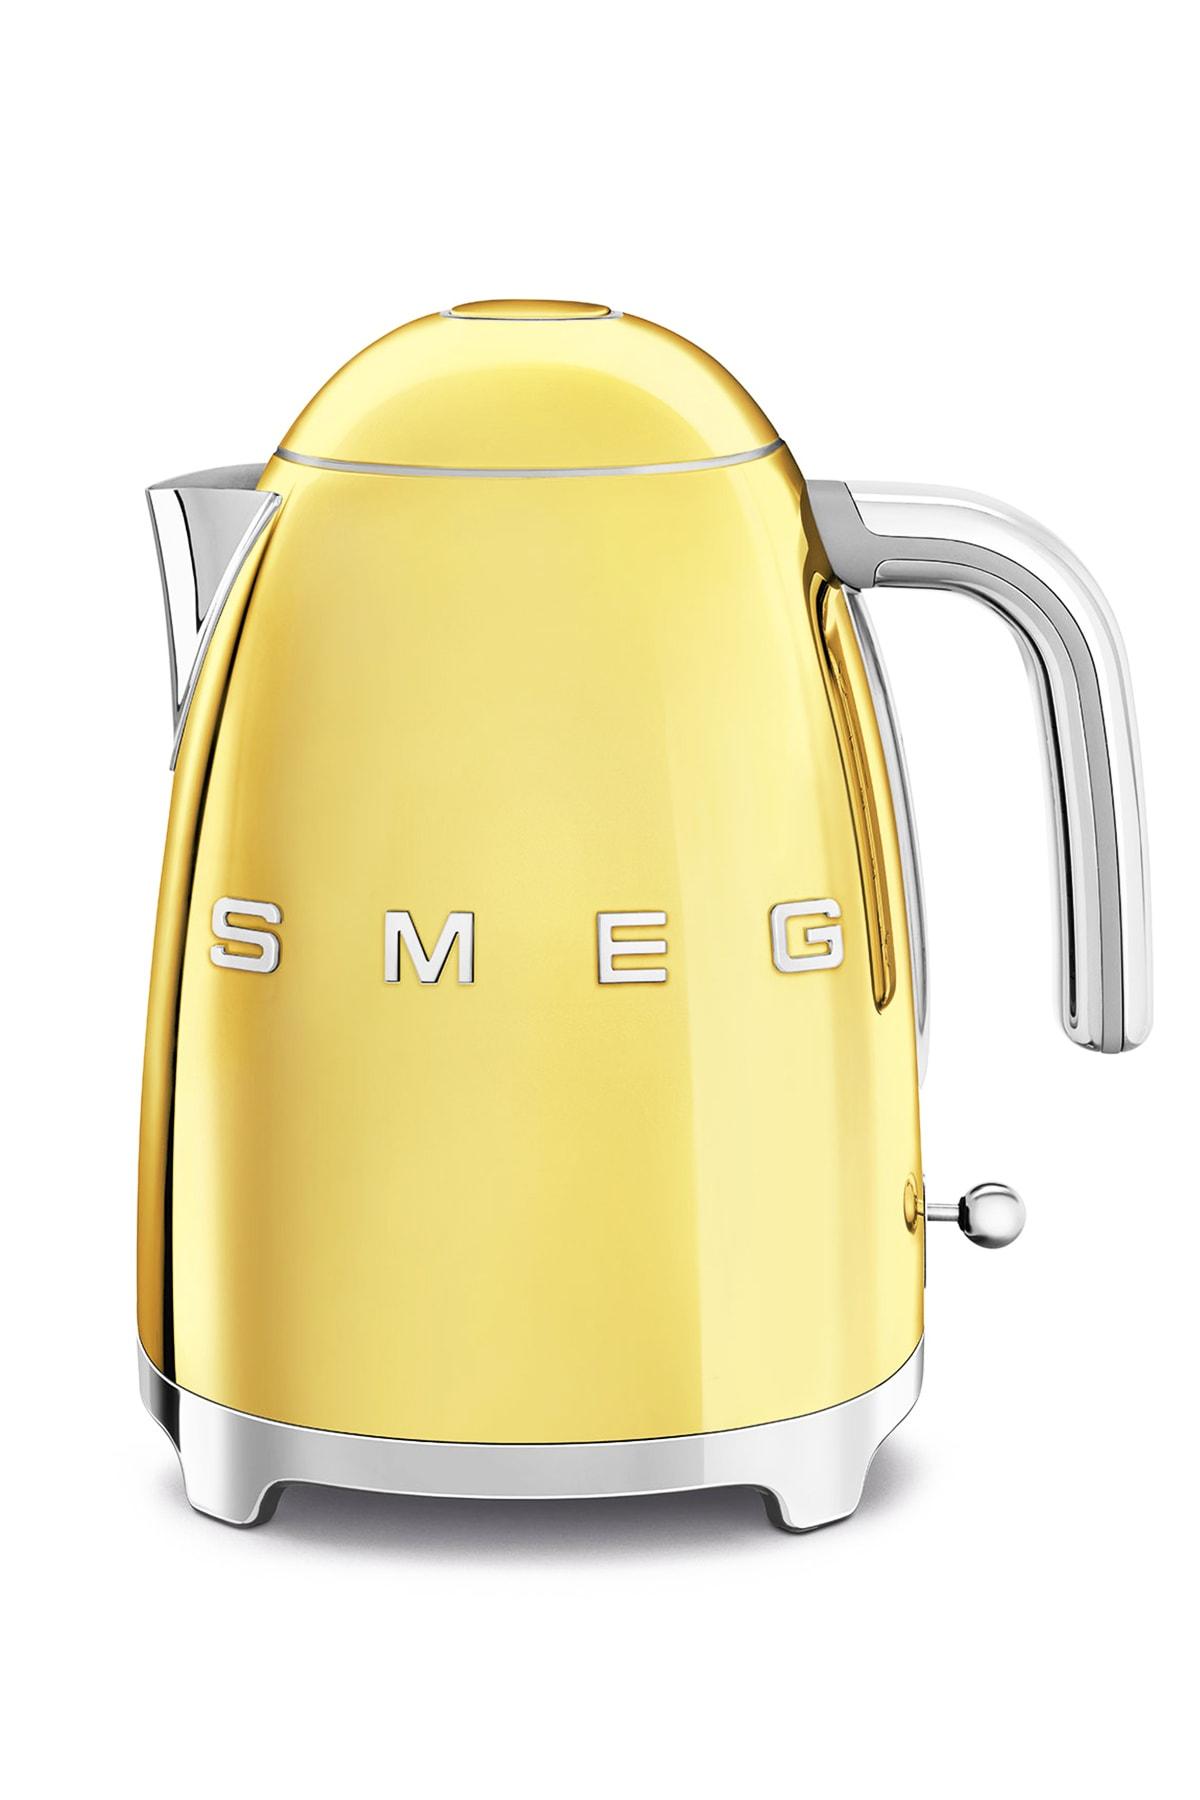 SMEG Altın Rengi 50's Style Kettle Klf03goeu 1